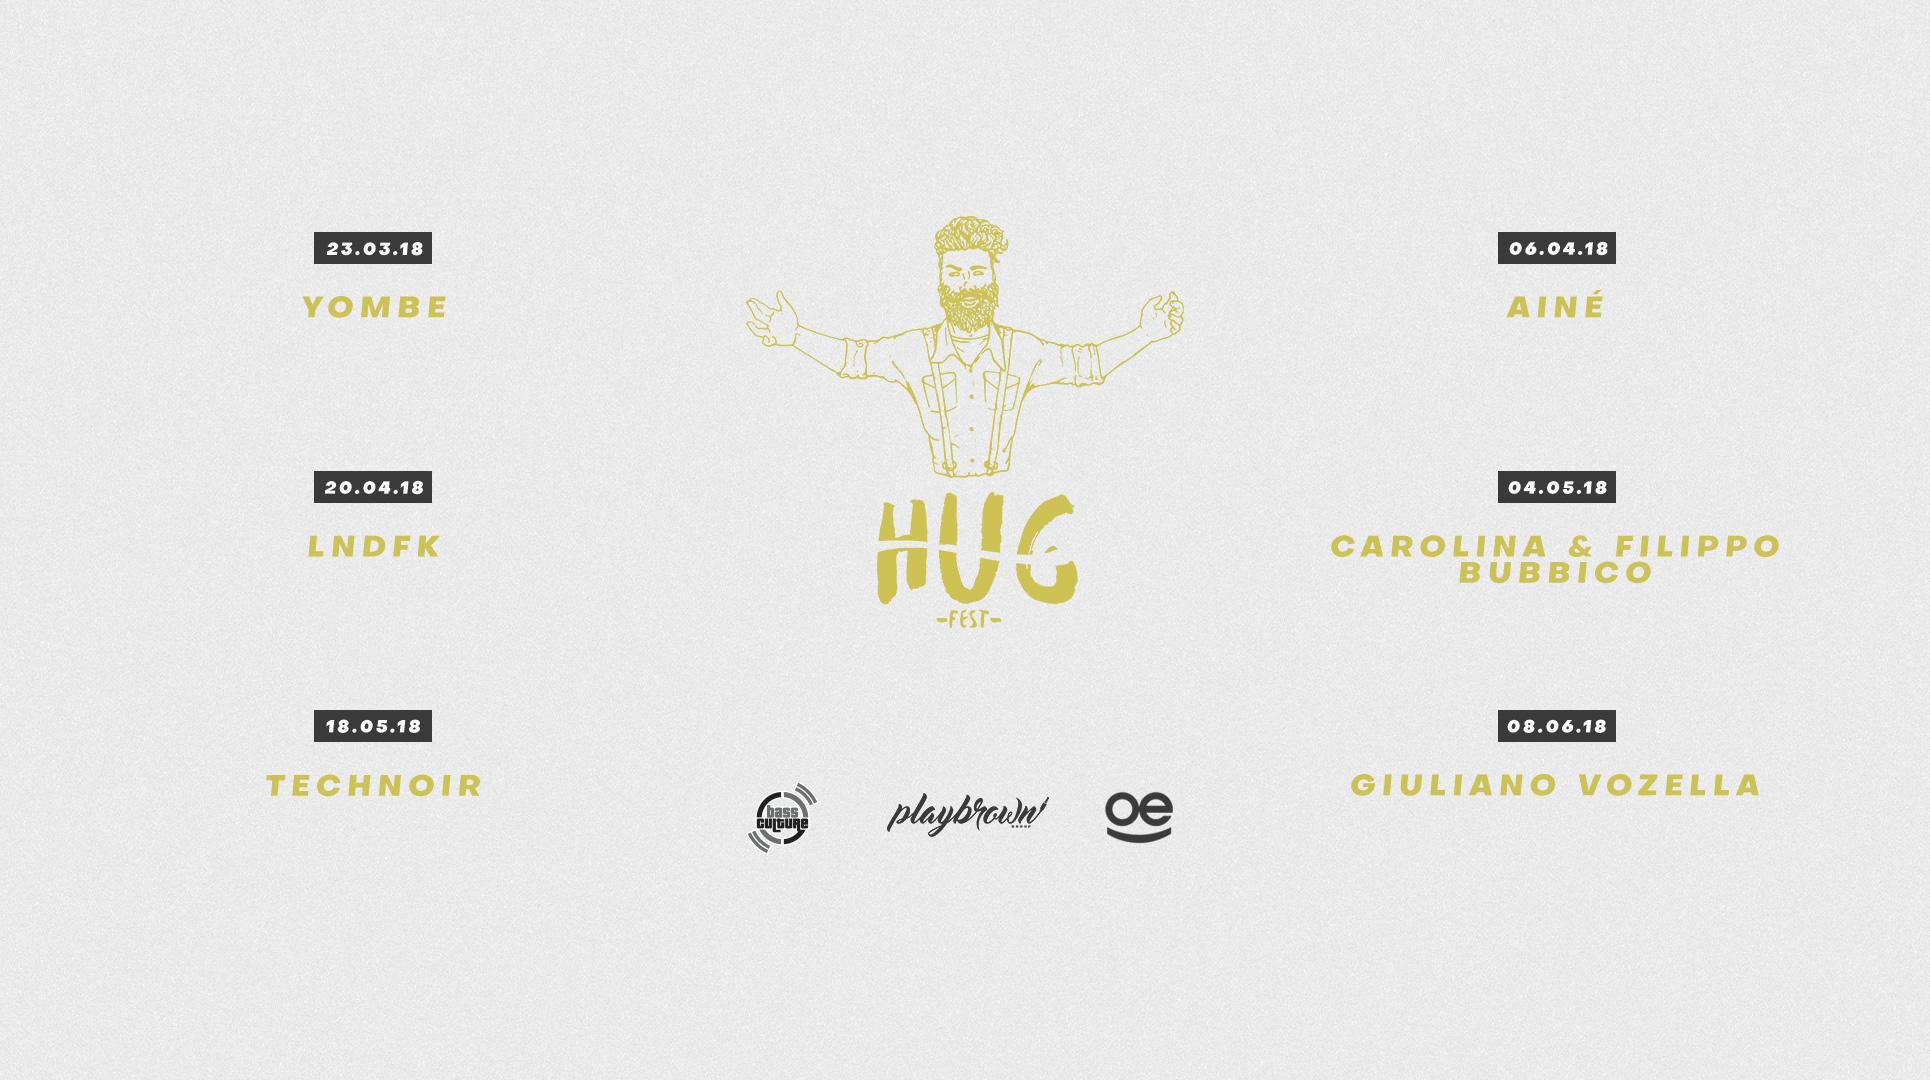 hug fest 2018 officina degli esordi